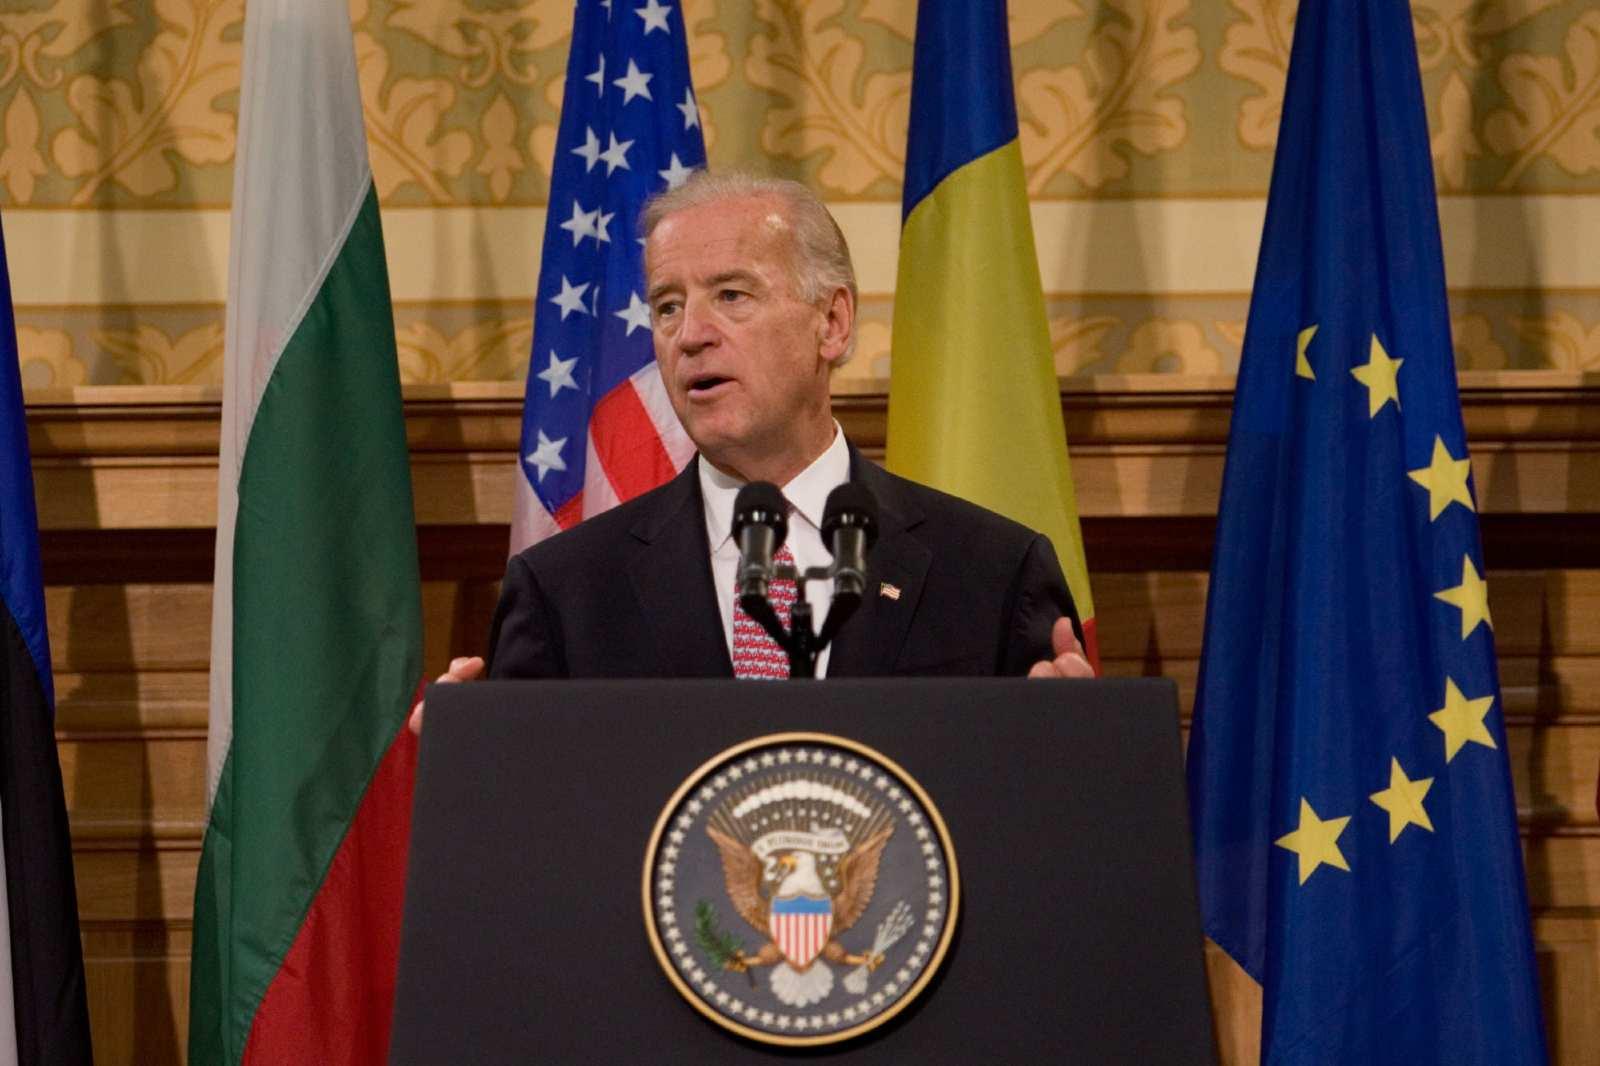 Vice President Joe Biden speaks at the Central University Library Bucharest, in Bucharest, Romania. October 22, 2009. (Official White House Photo by David Lienemann)